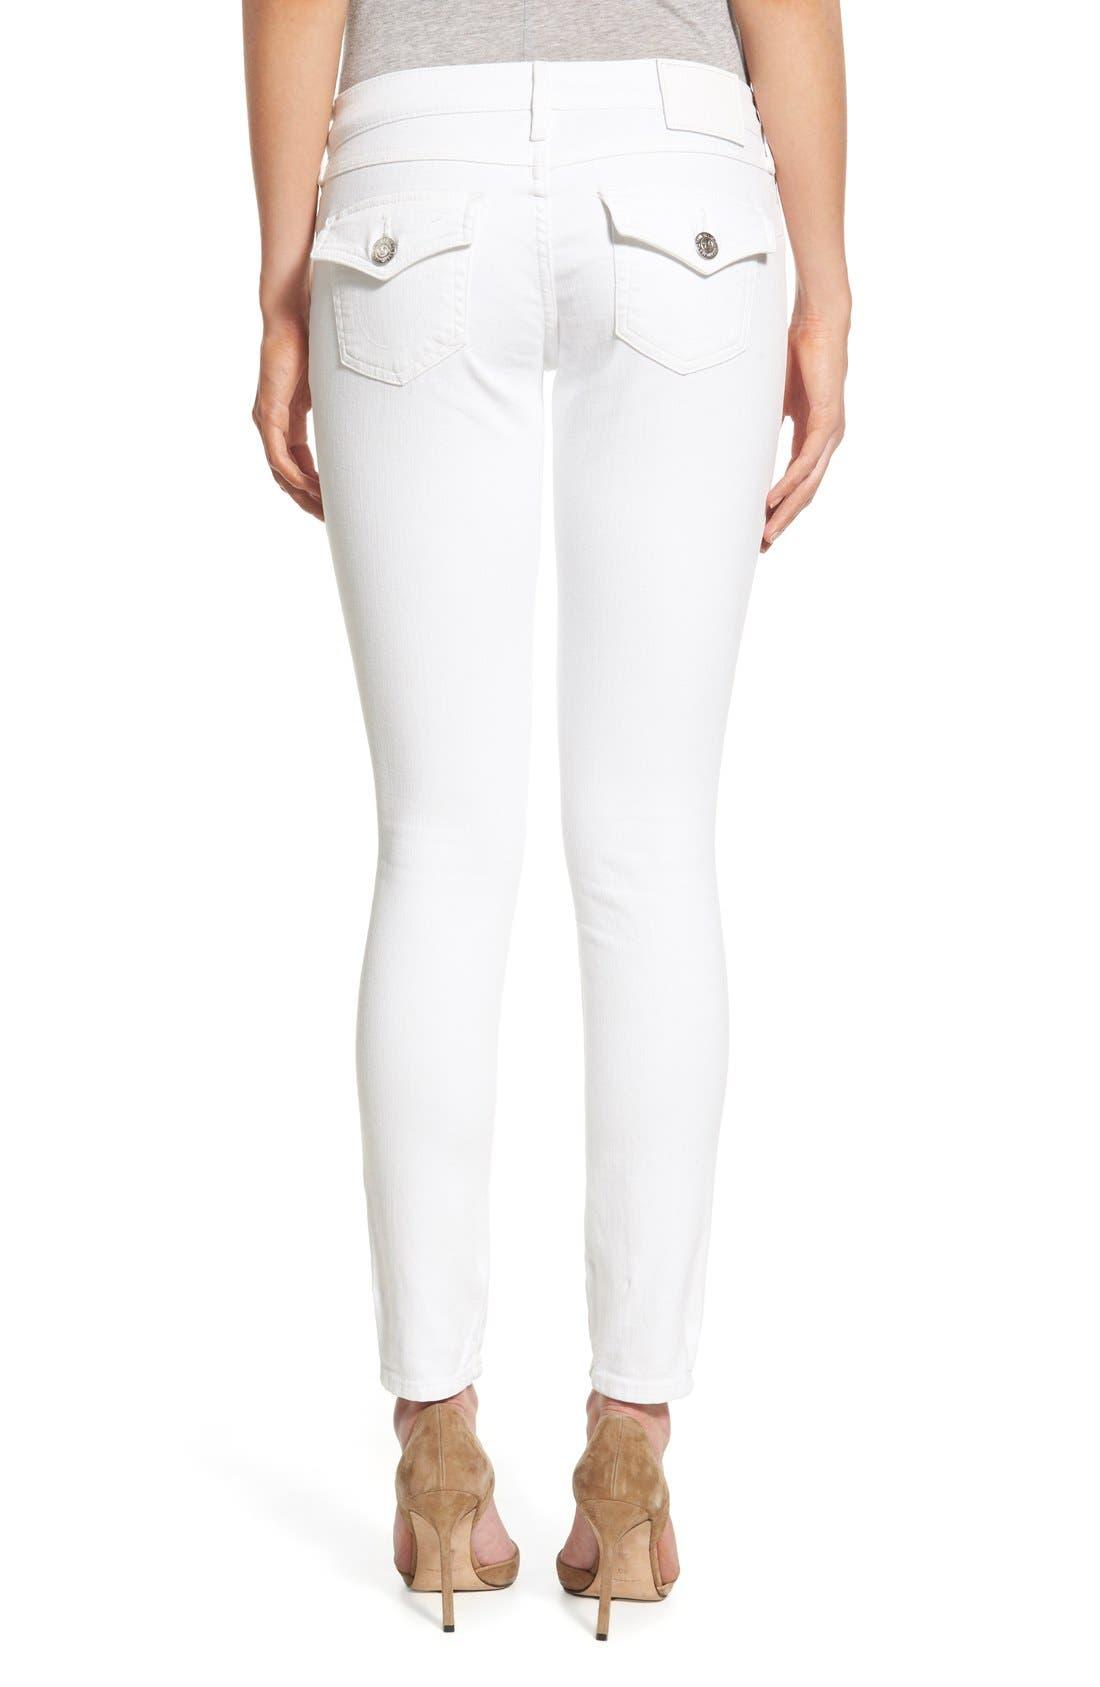 Alternate Image 2  - True Religion Brand Jeans 'Casey' Flap Pocket Skinny Jeans (Optic White)